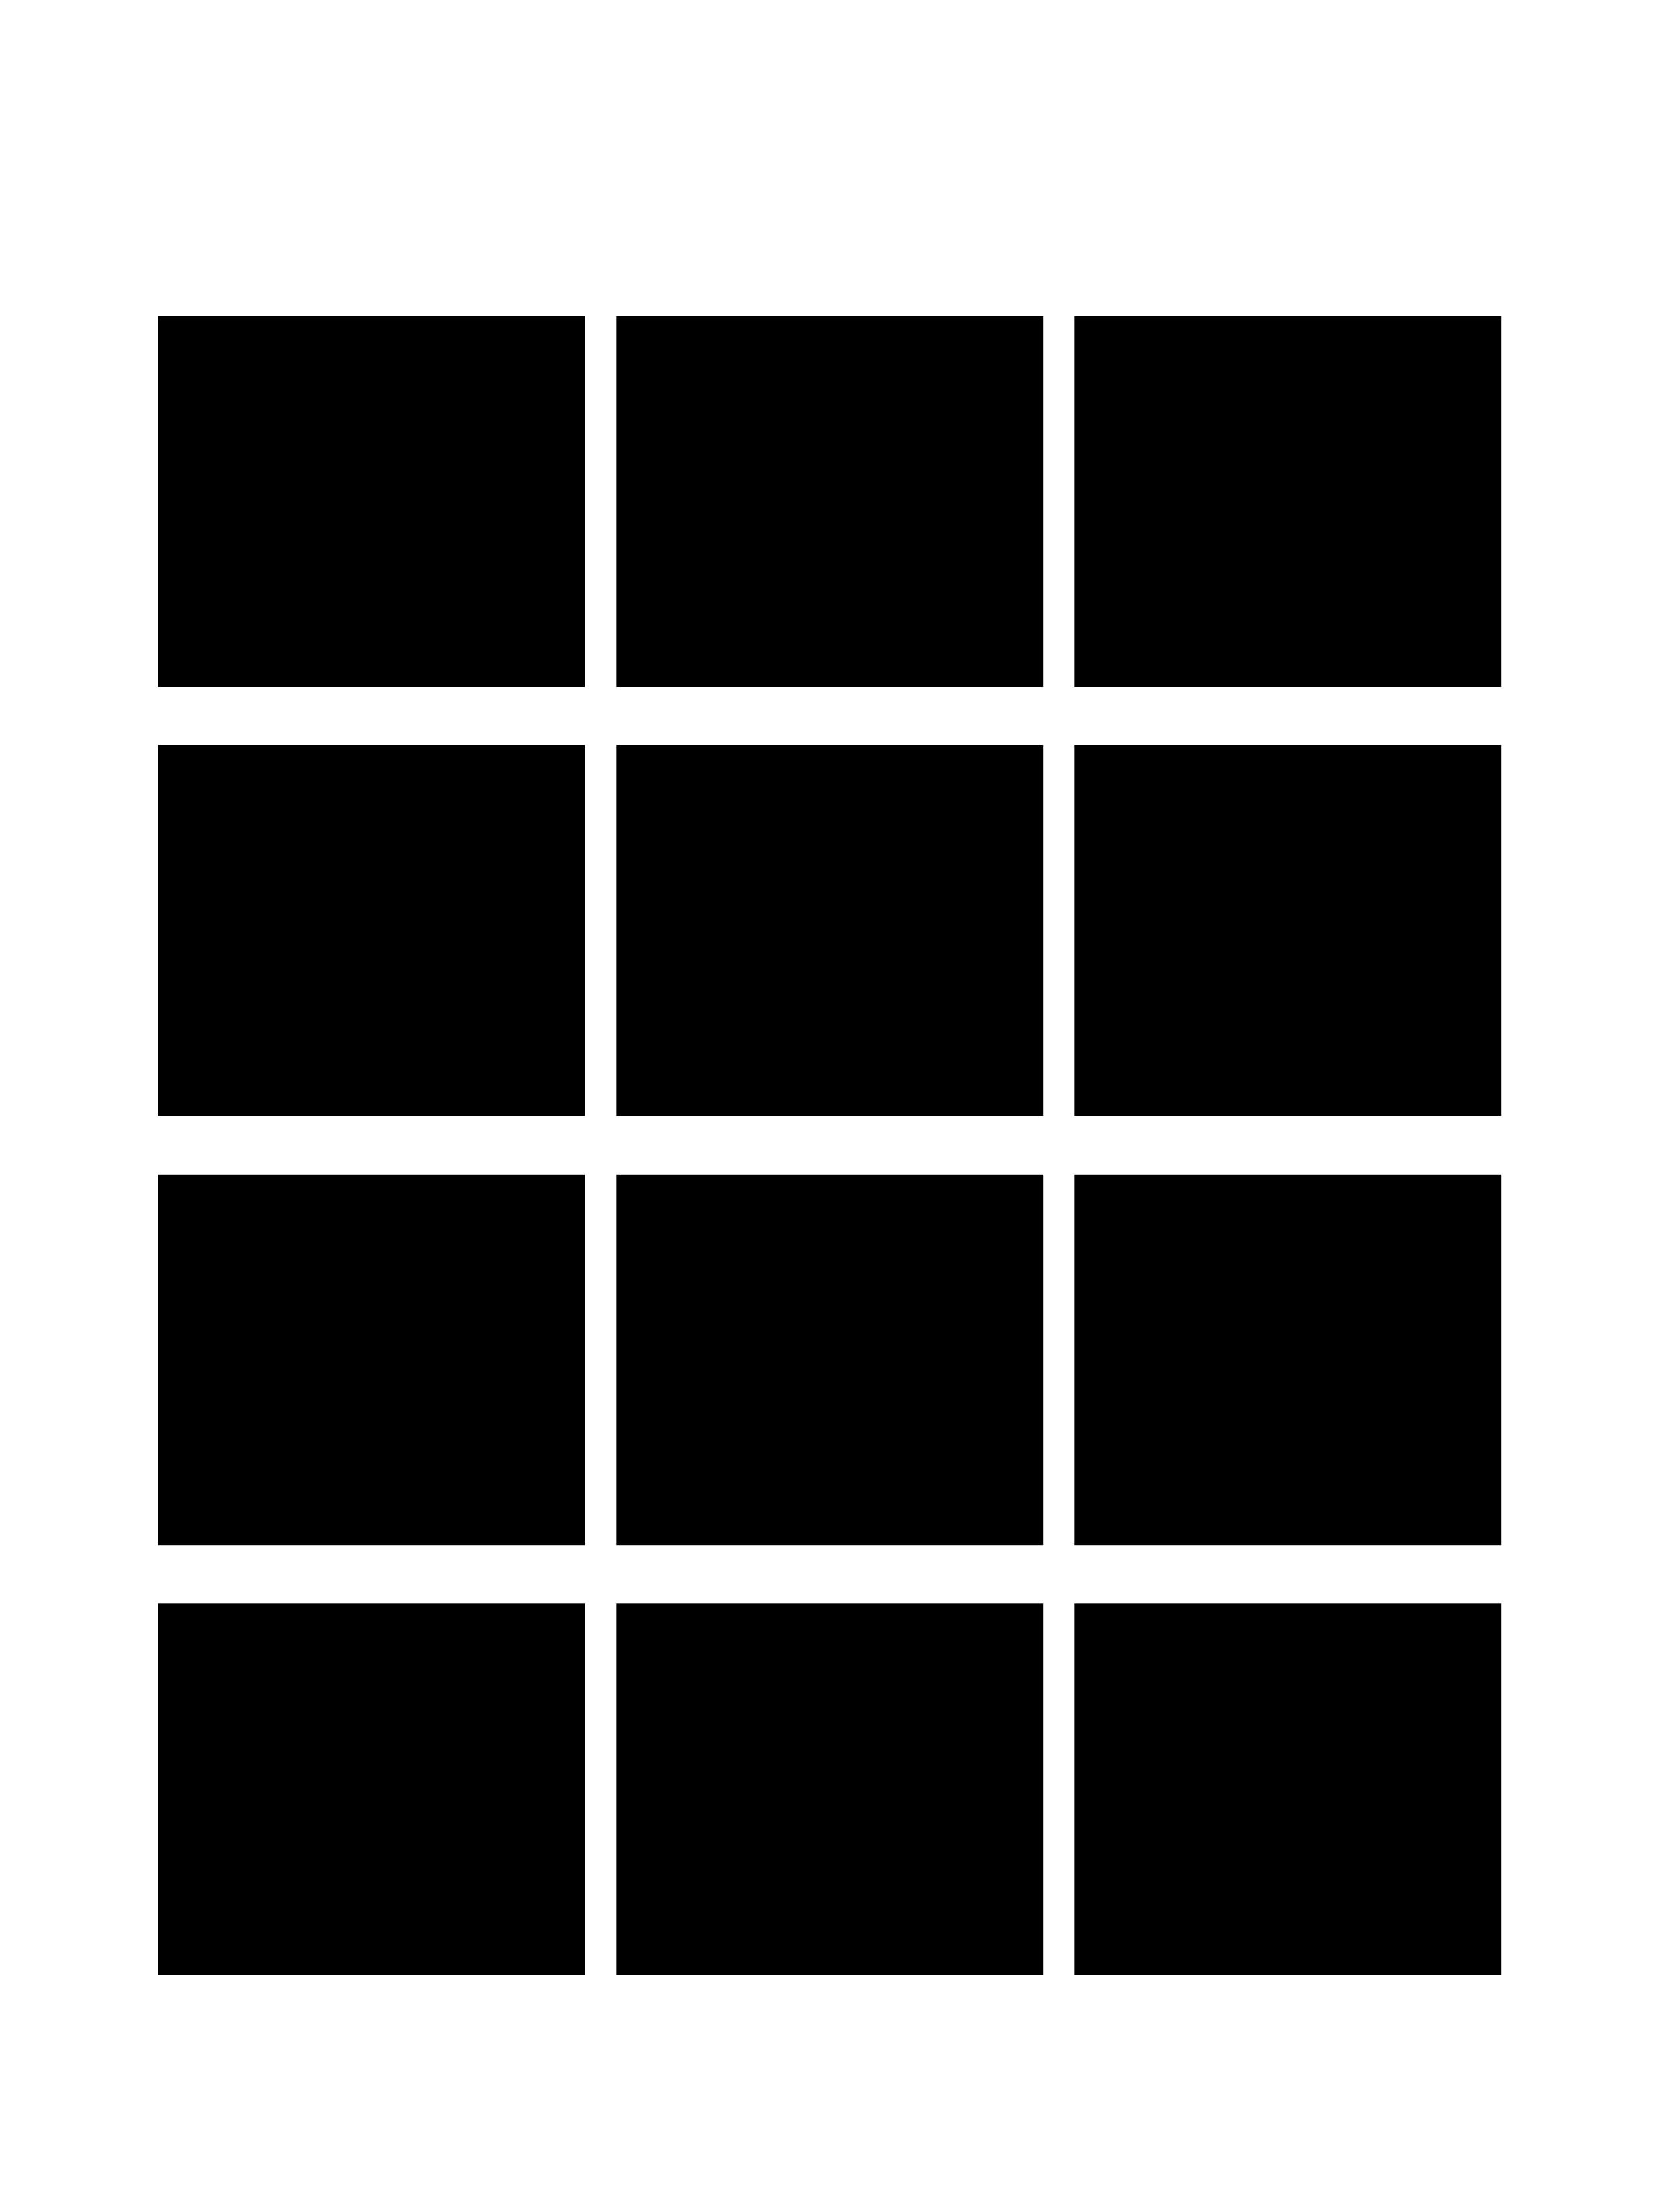 grid design white space